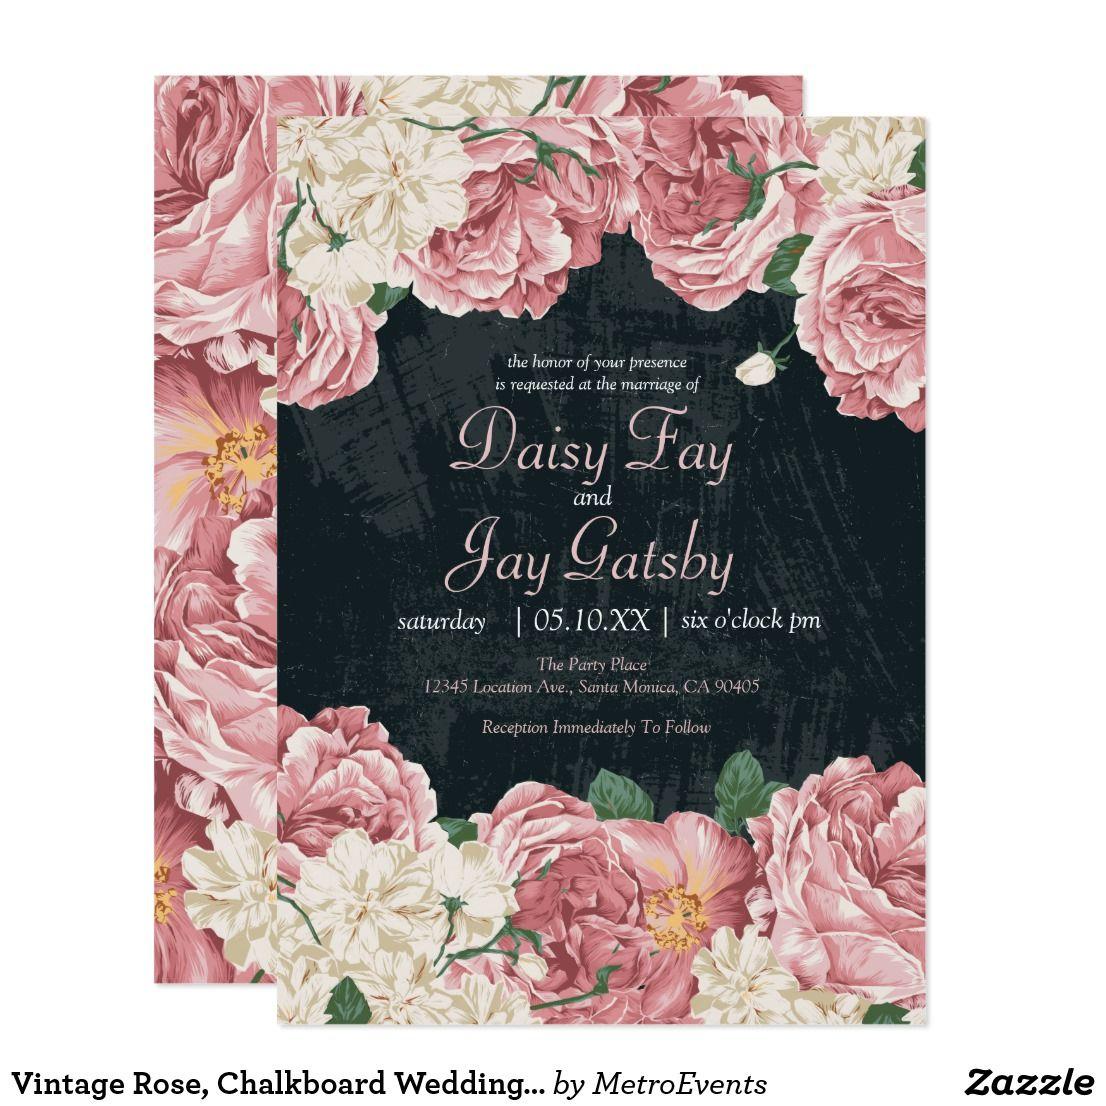 Vintage Rose Chalkboard Wedding Invitations Chalkboard Wedding